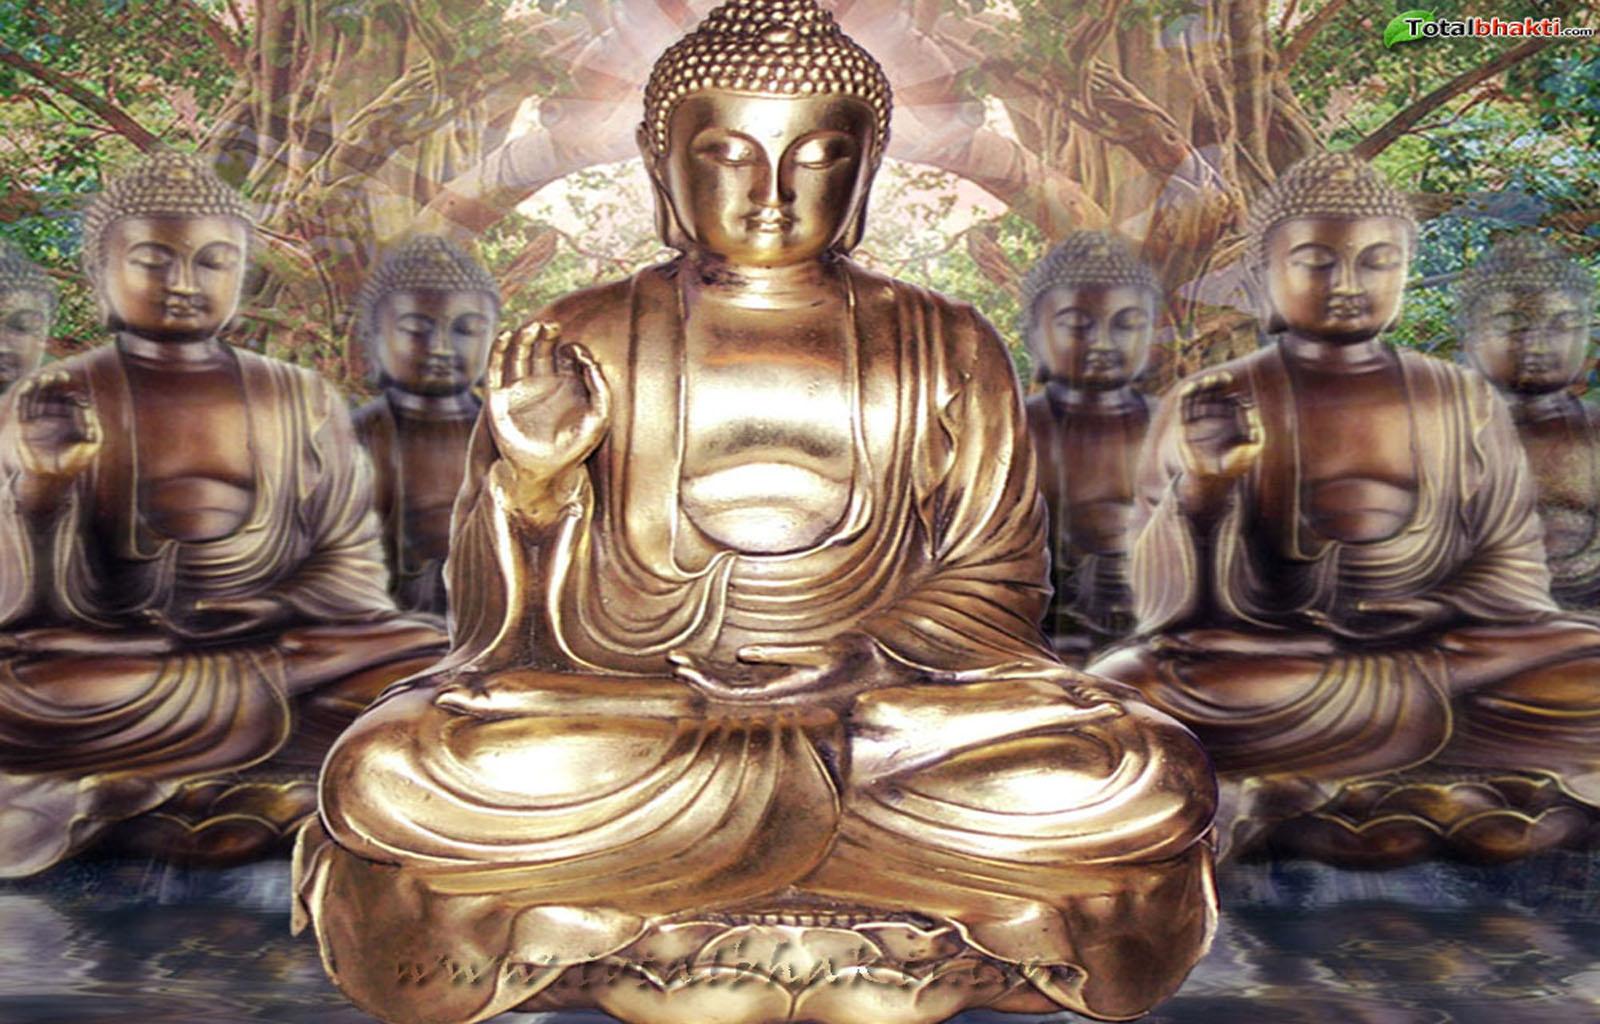 Best Hd Live Wallpaper Bali Buddha God Wallpapers